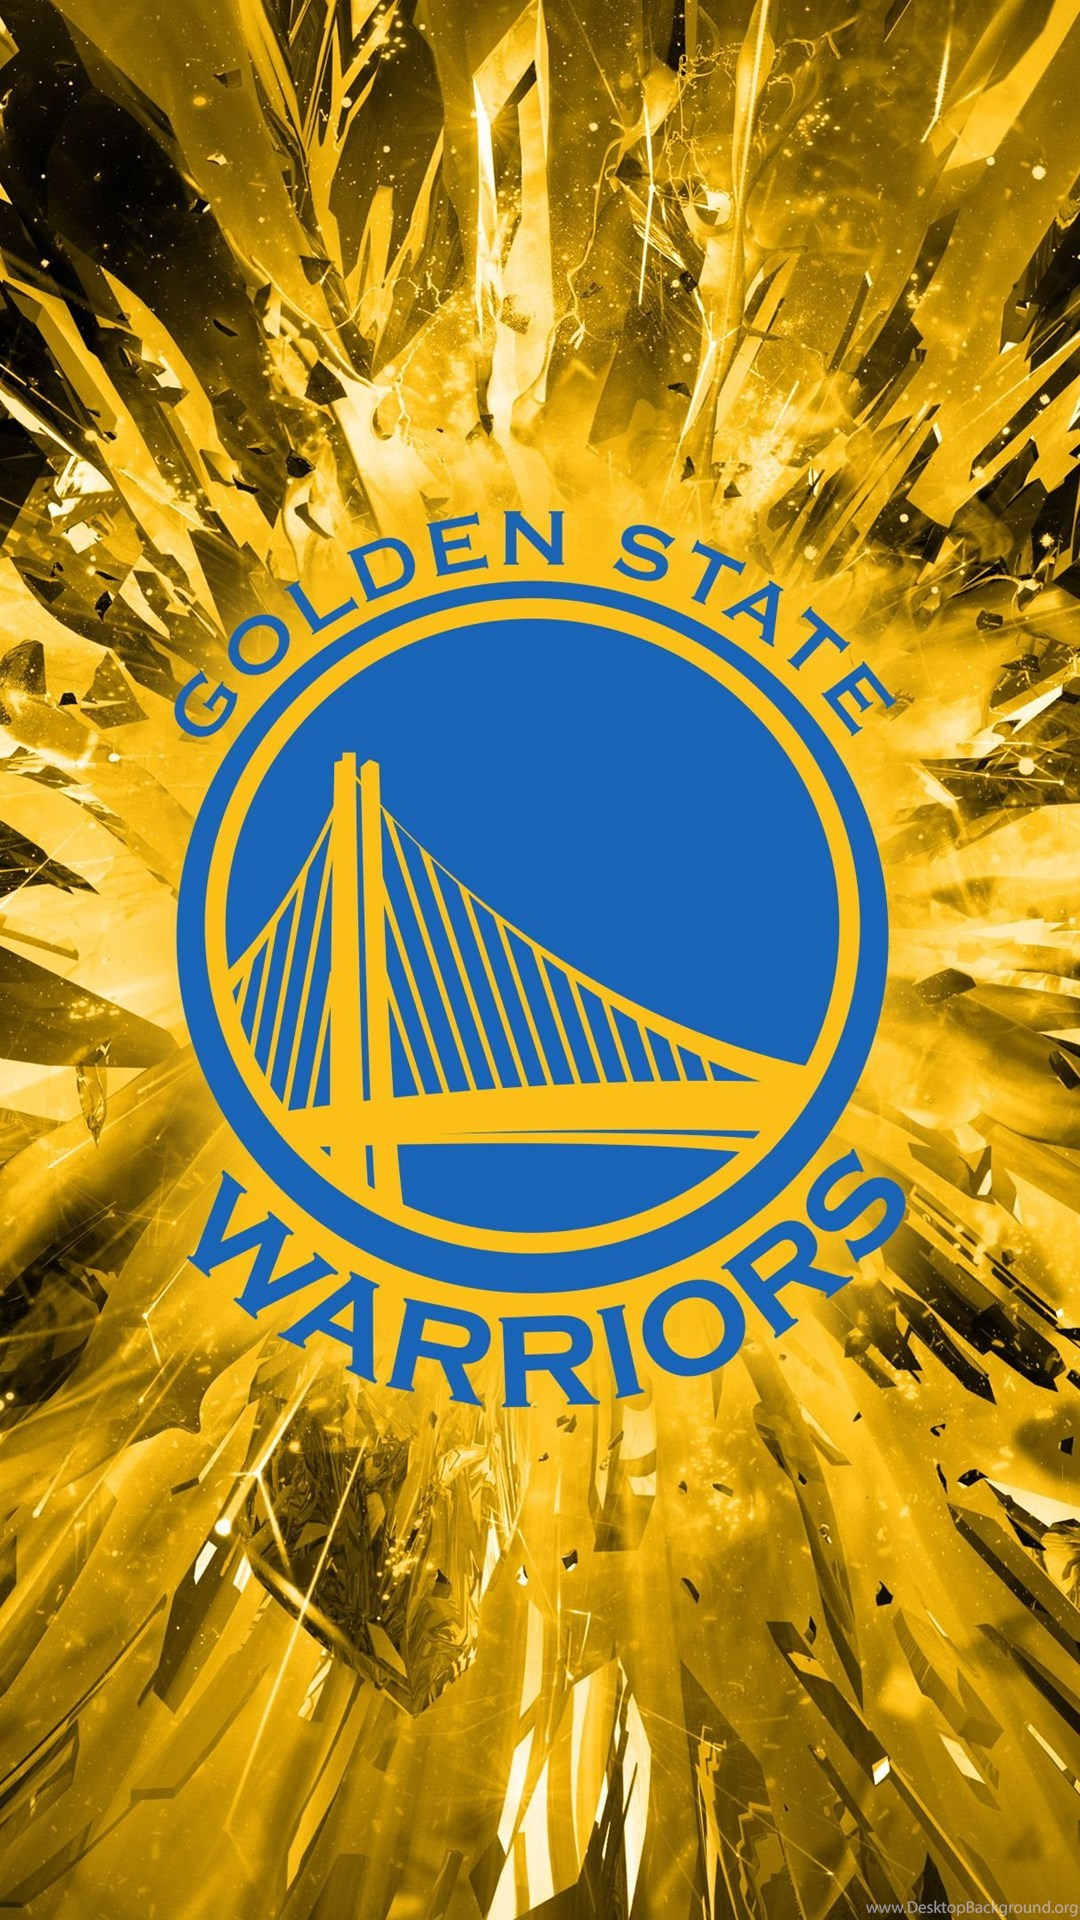 Golden State Warriors Logo 2014 Wallpaper Desktop Background